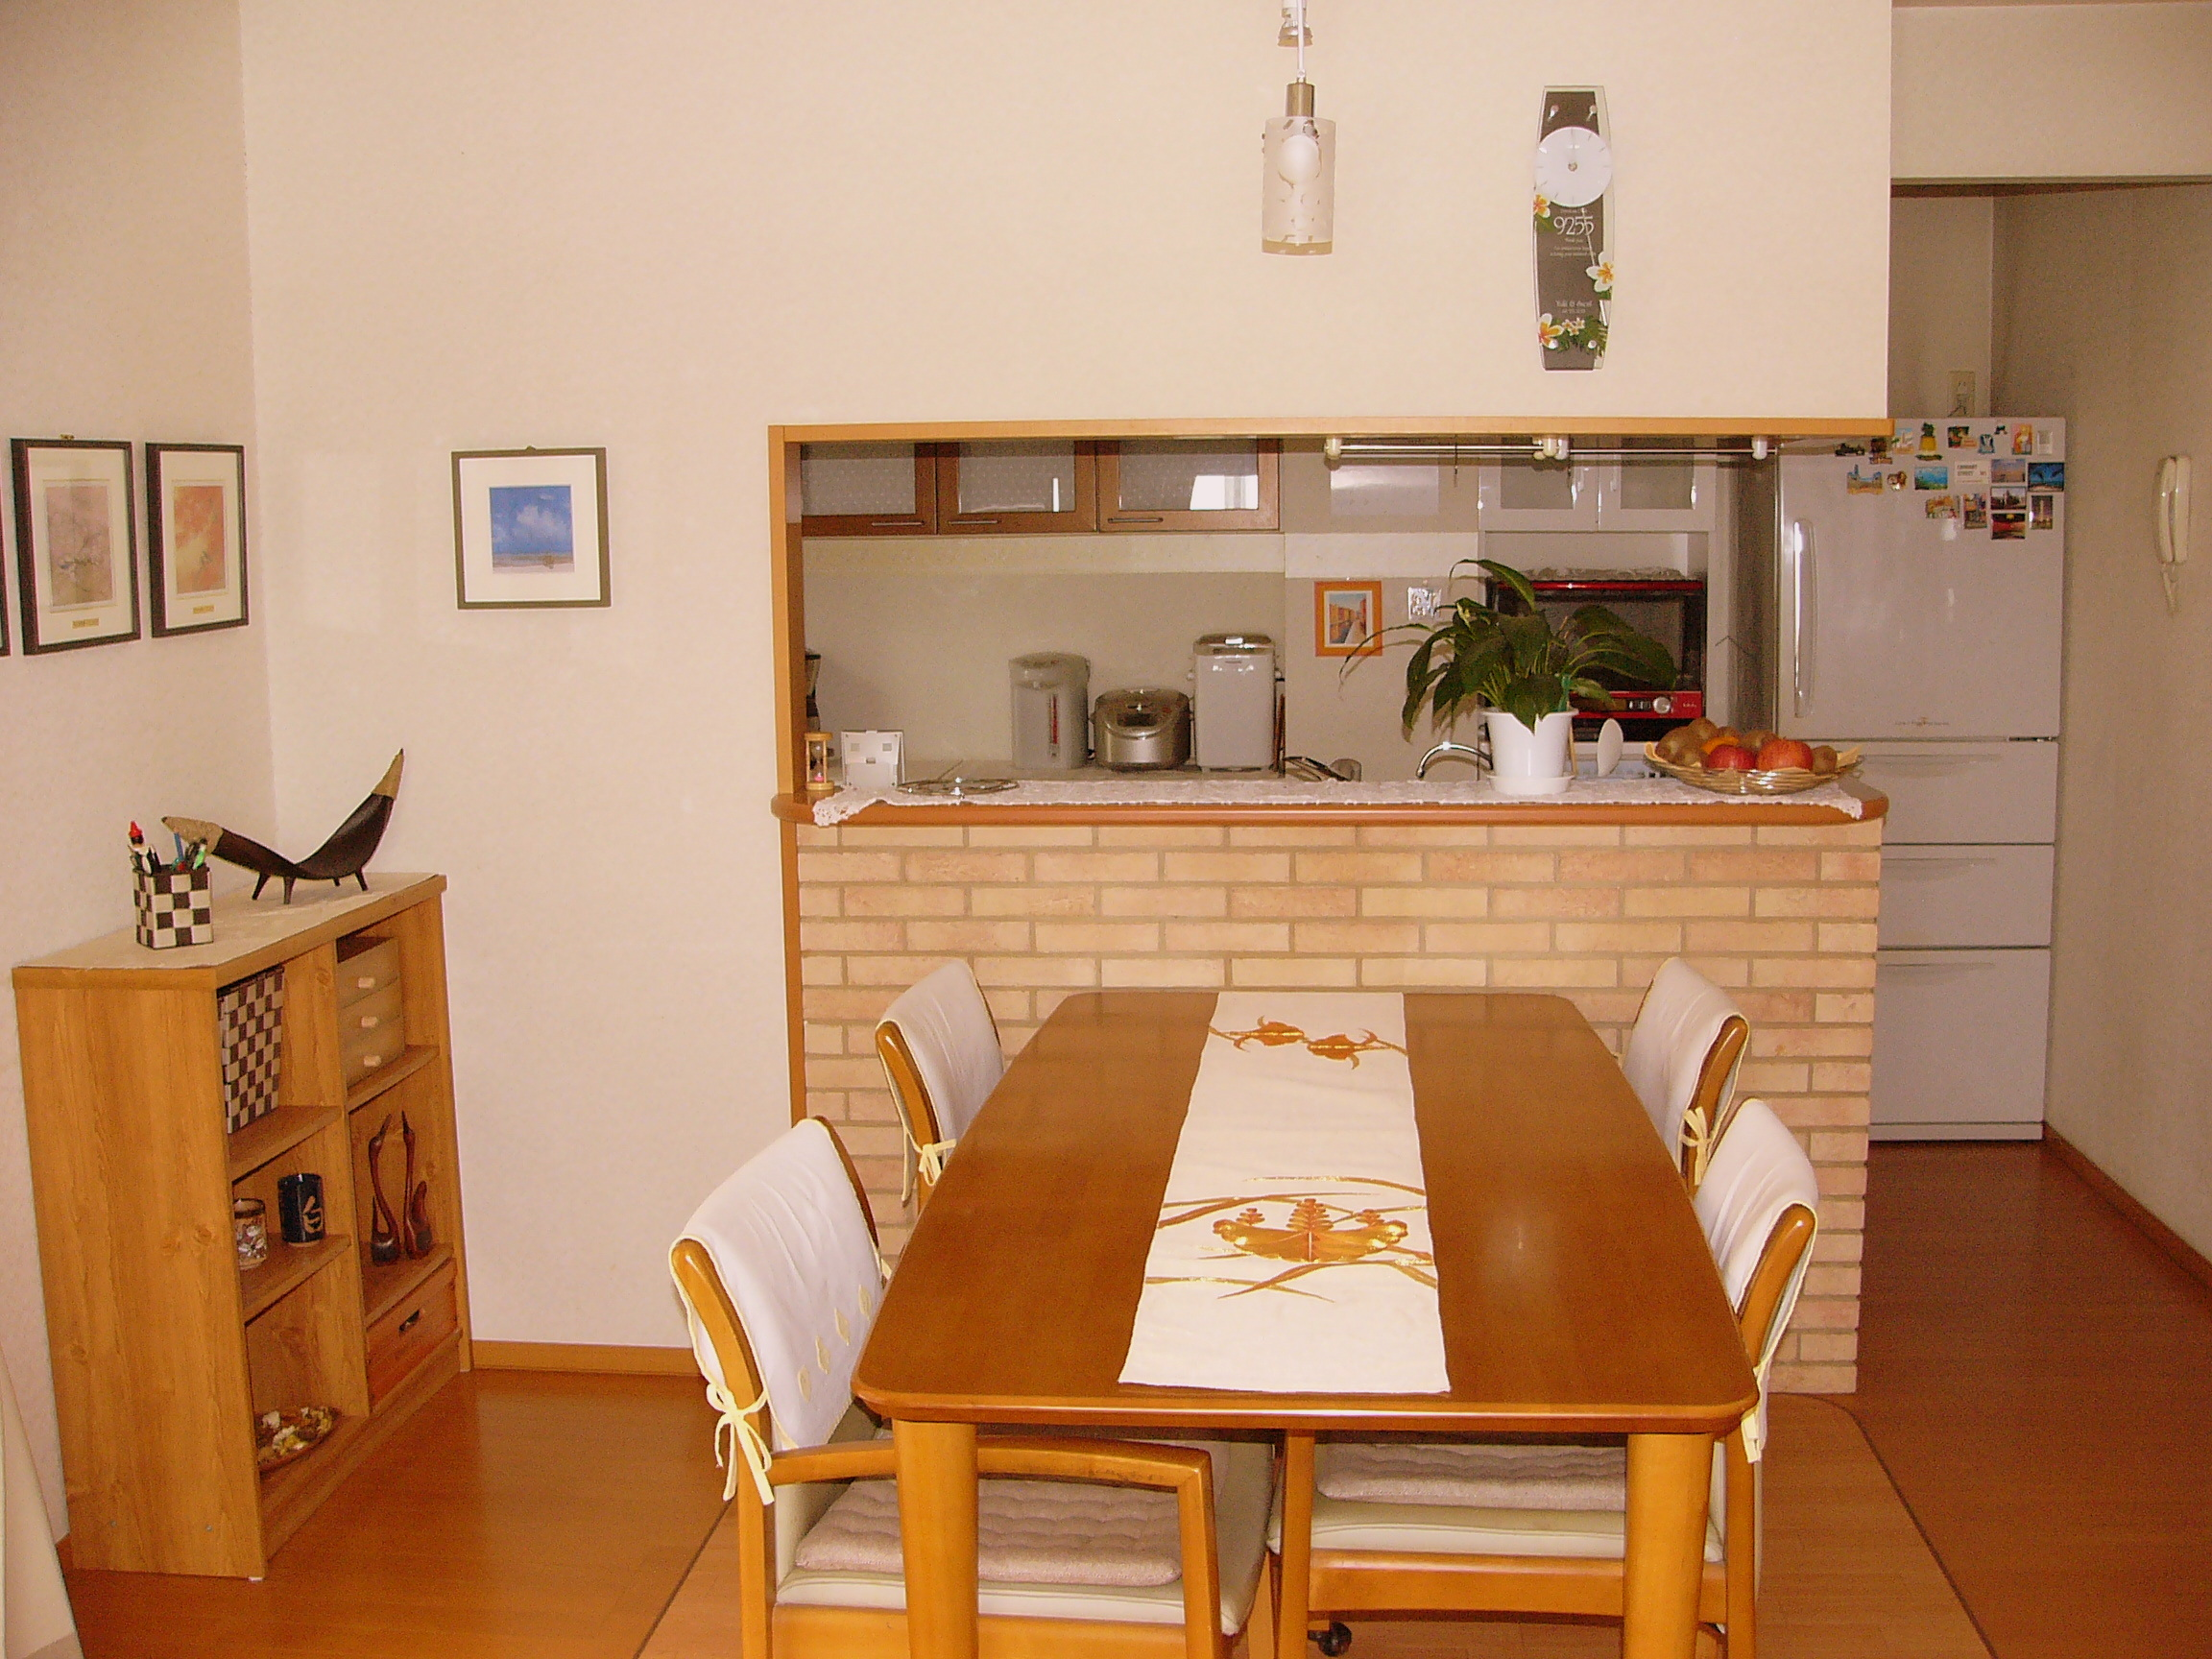 30 Cucina Con Muretto Divisorio - Inidpfohor